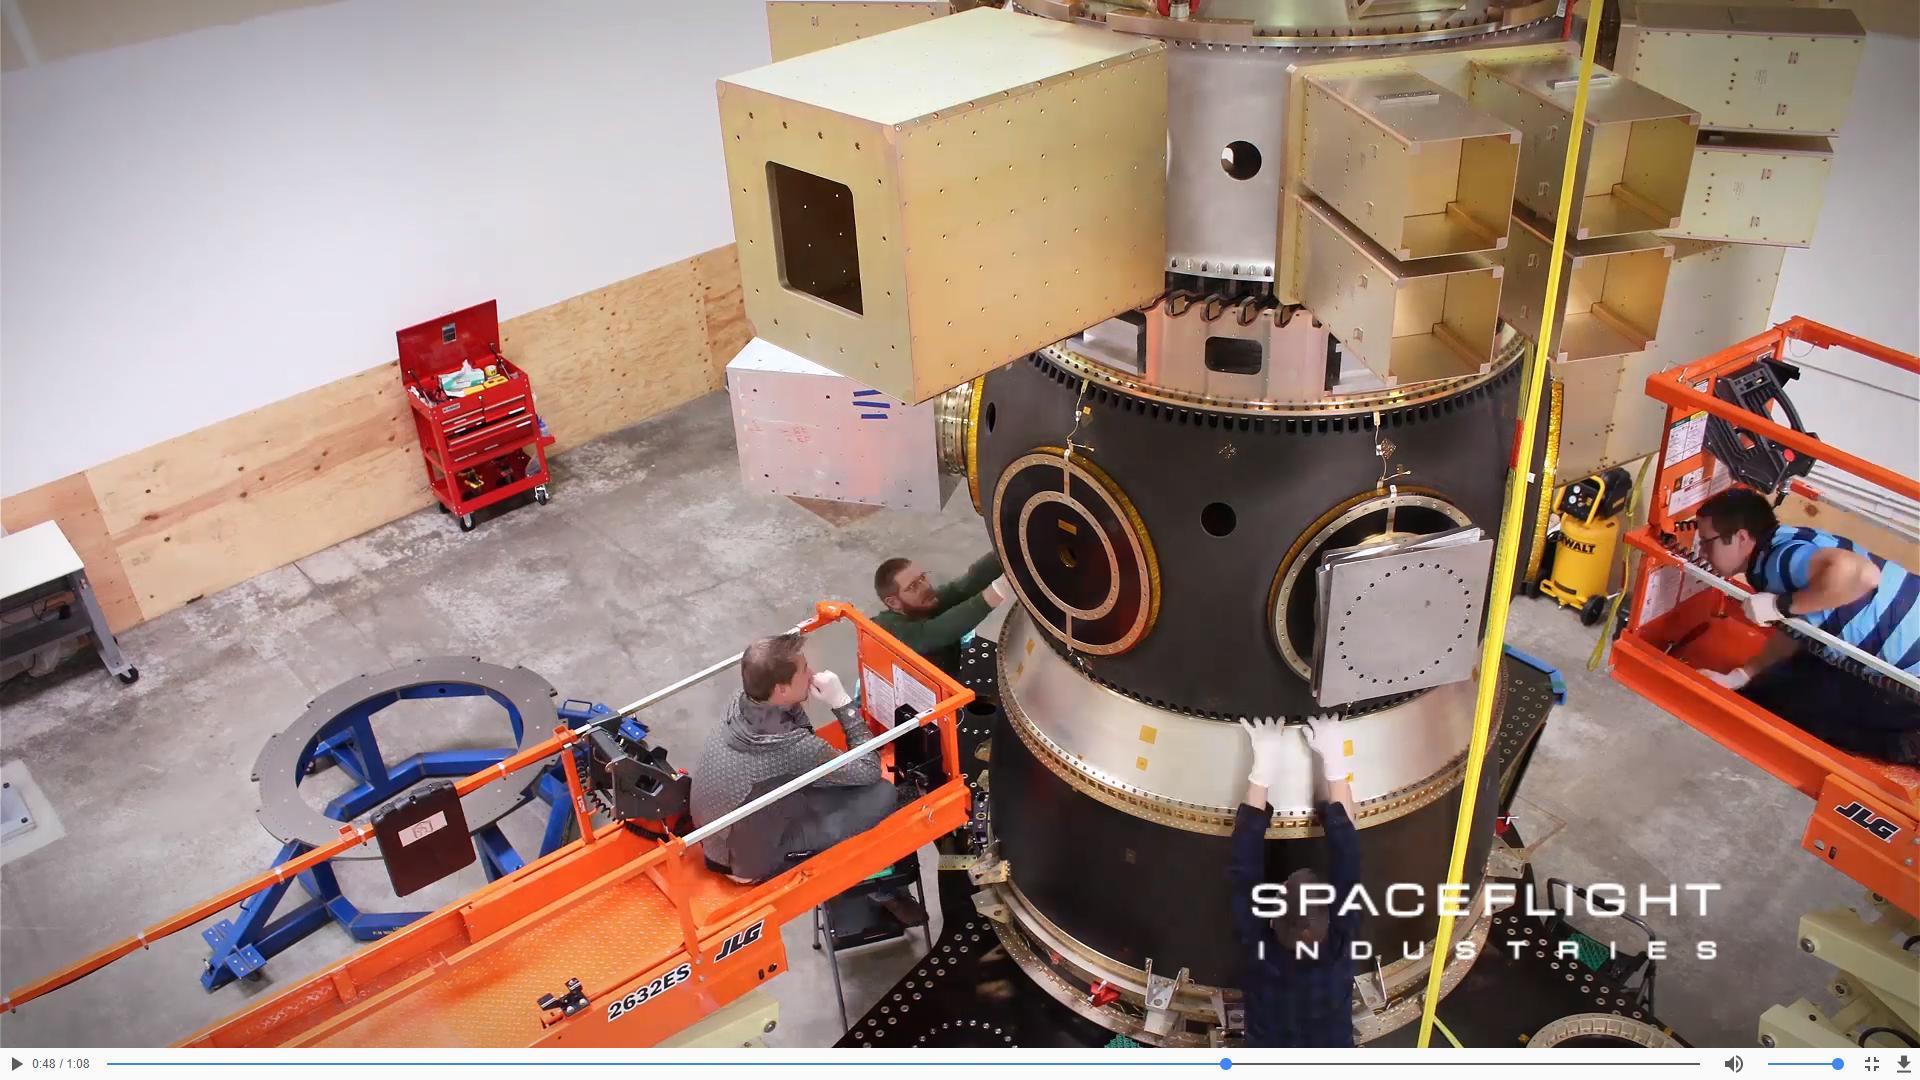 SSO-A preparation 2017 (Spaceflight Industries) 1